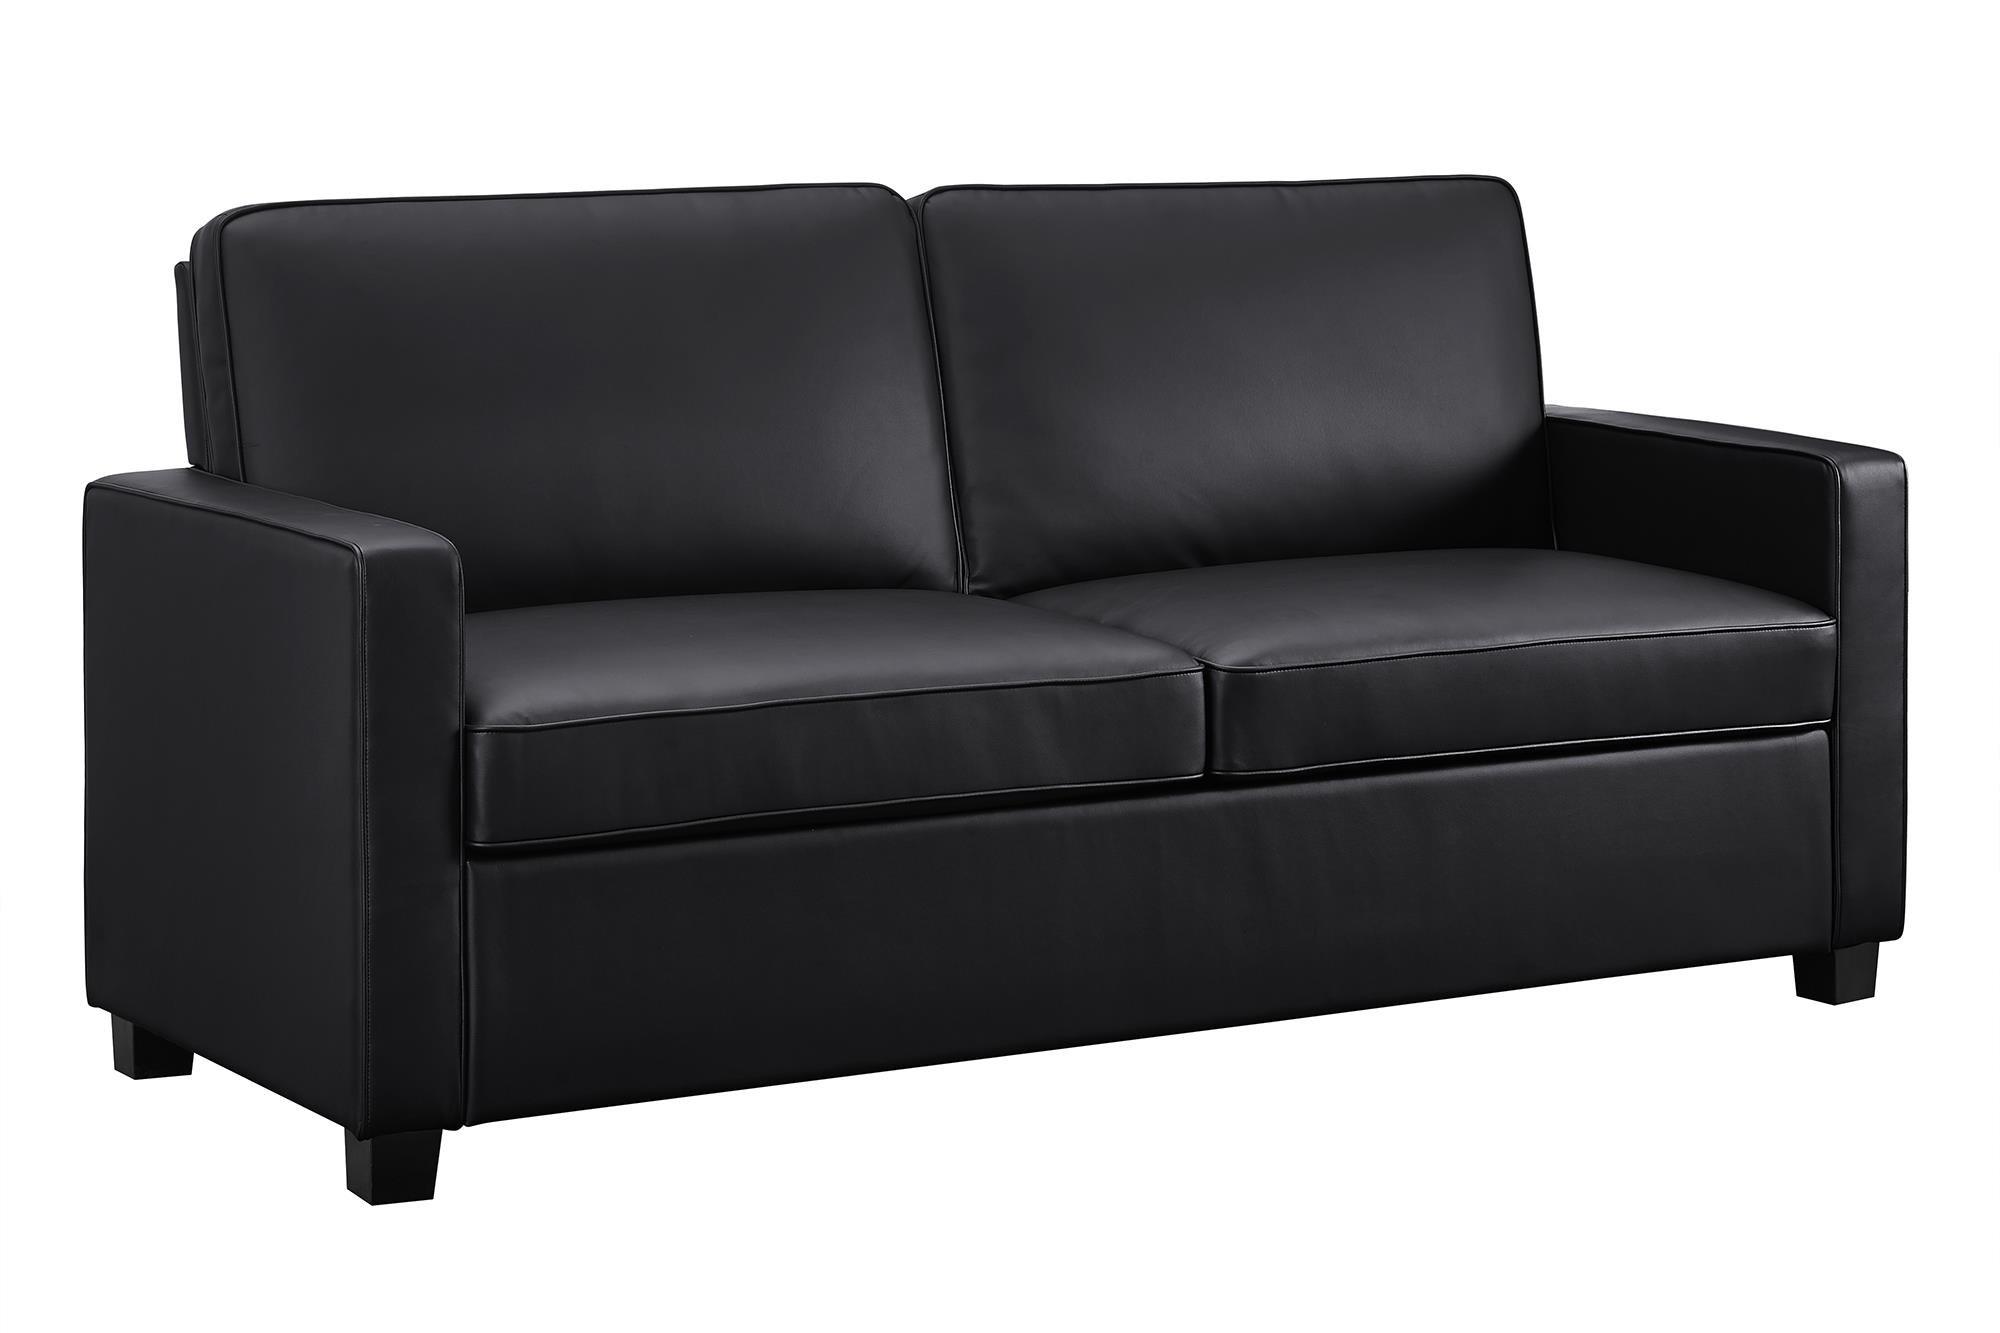 sofa beds full size amazon com rh amazon com full size sofa sleeper walmart full size sofa sleeper